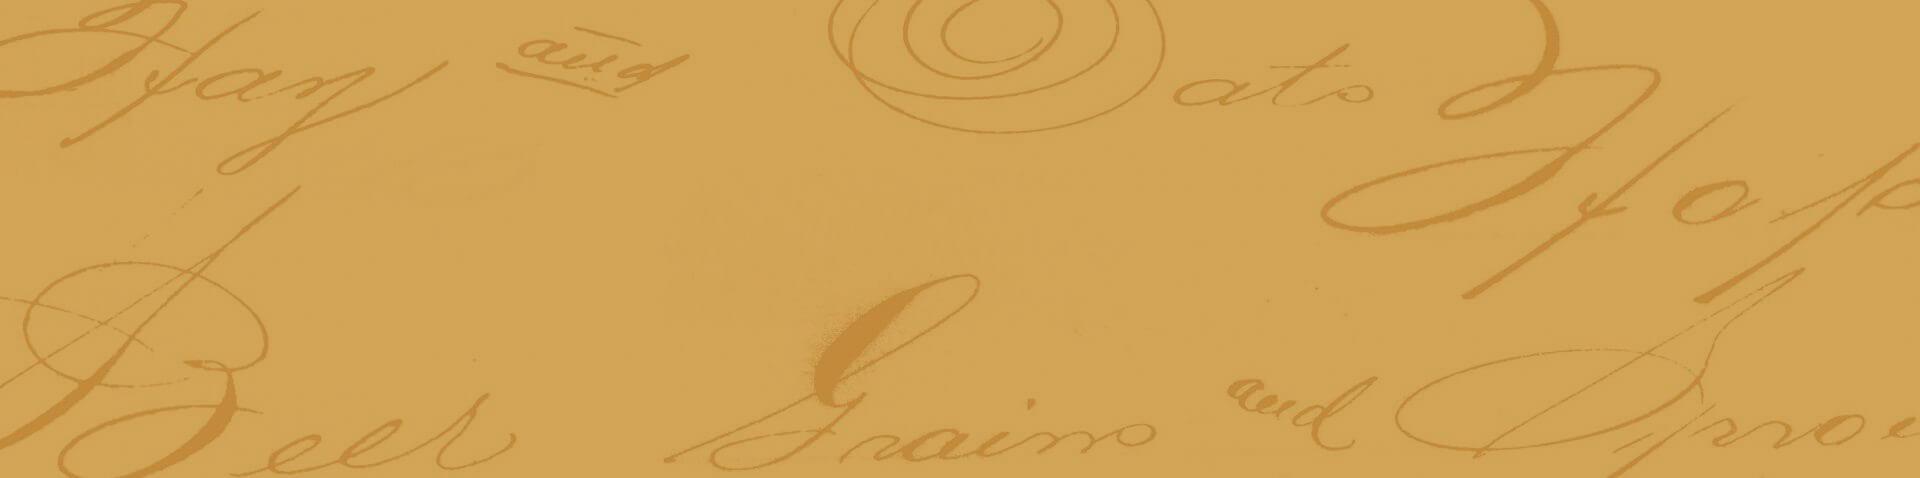 Script decorative background